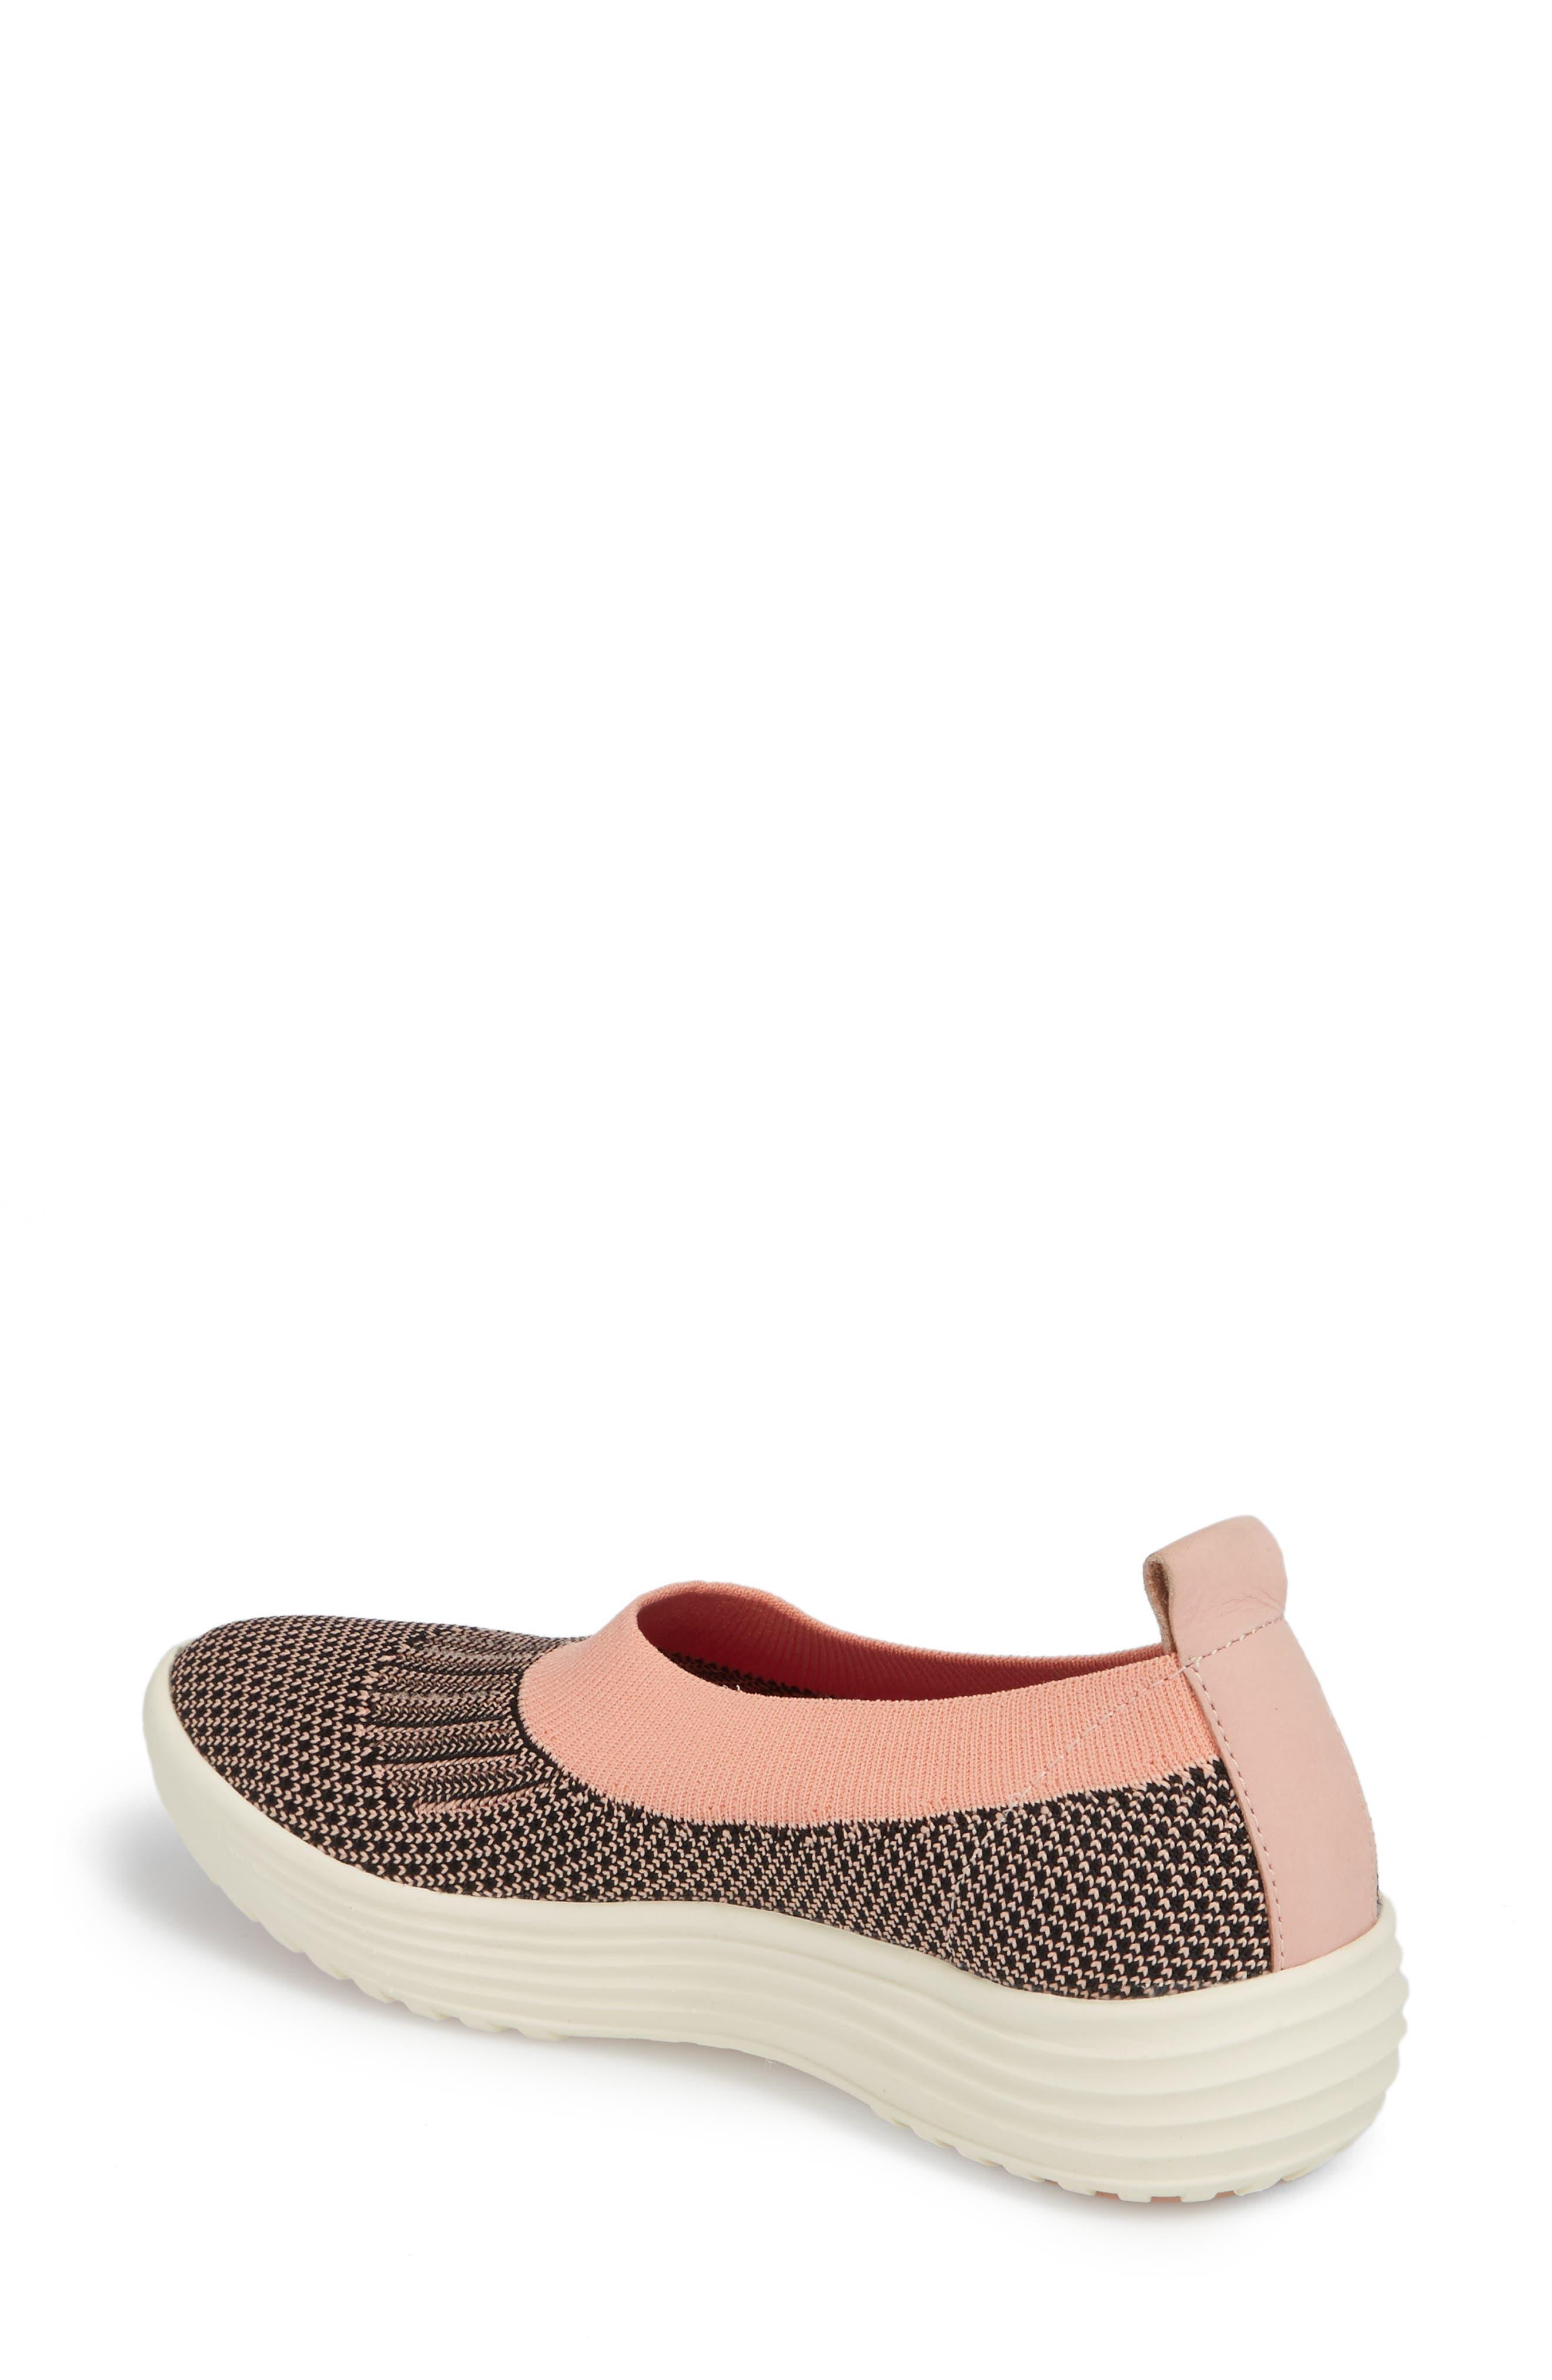 Merigold Slip-On Sock Fit Sneaker,                             Alternate thumbnail 2, color,                             Pink/ Black Knit Fabric